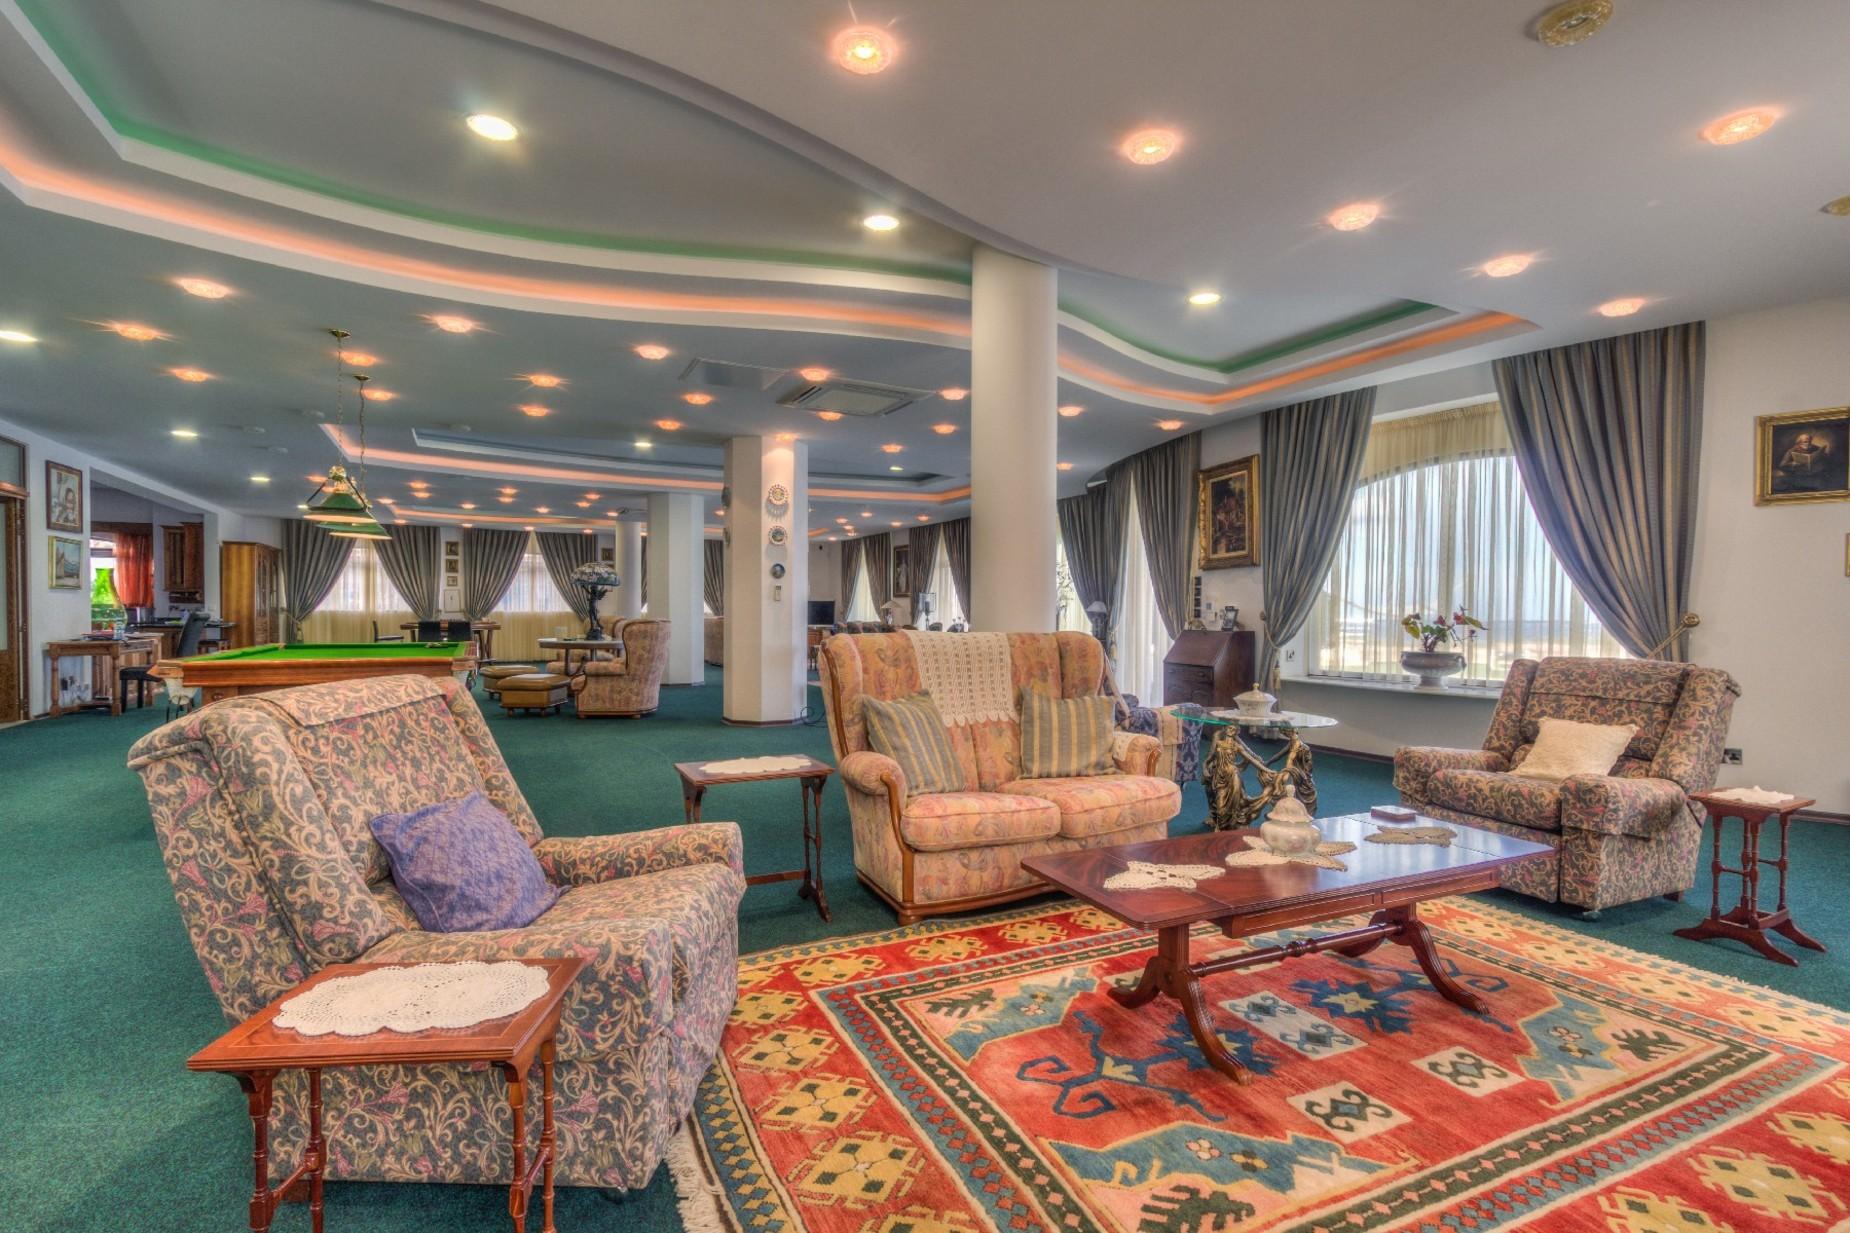 7 bed Villa For Rent in Mellieha, Mellieha - thumb 6